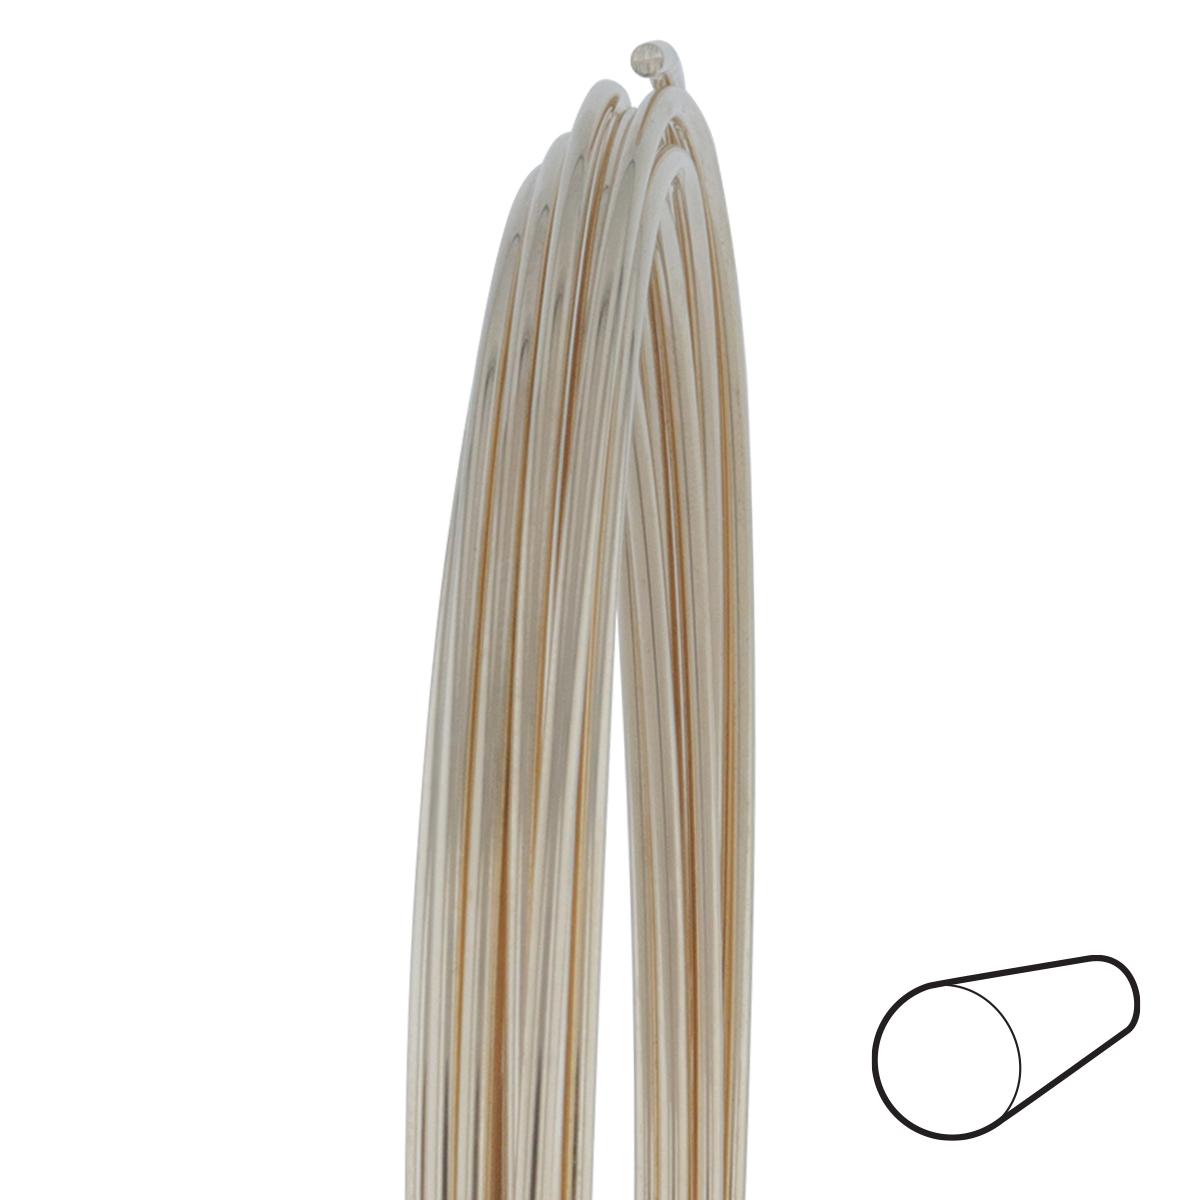 Half hard wire jewelry wire center 21 gauge round half hard 14 20 gold filled wire wire jewelry wire rh wirejewelry com dead soft or half hard wire for jewelry dead soft or half hard wire for greentooth Gallery